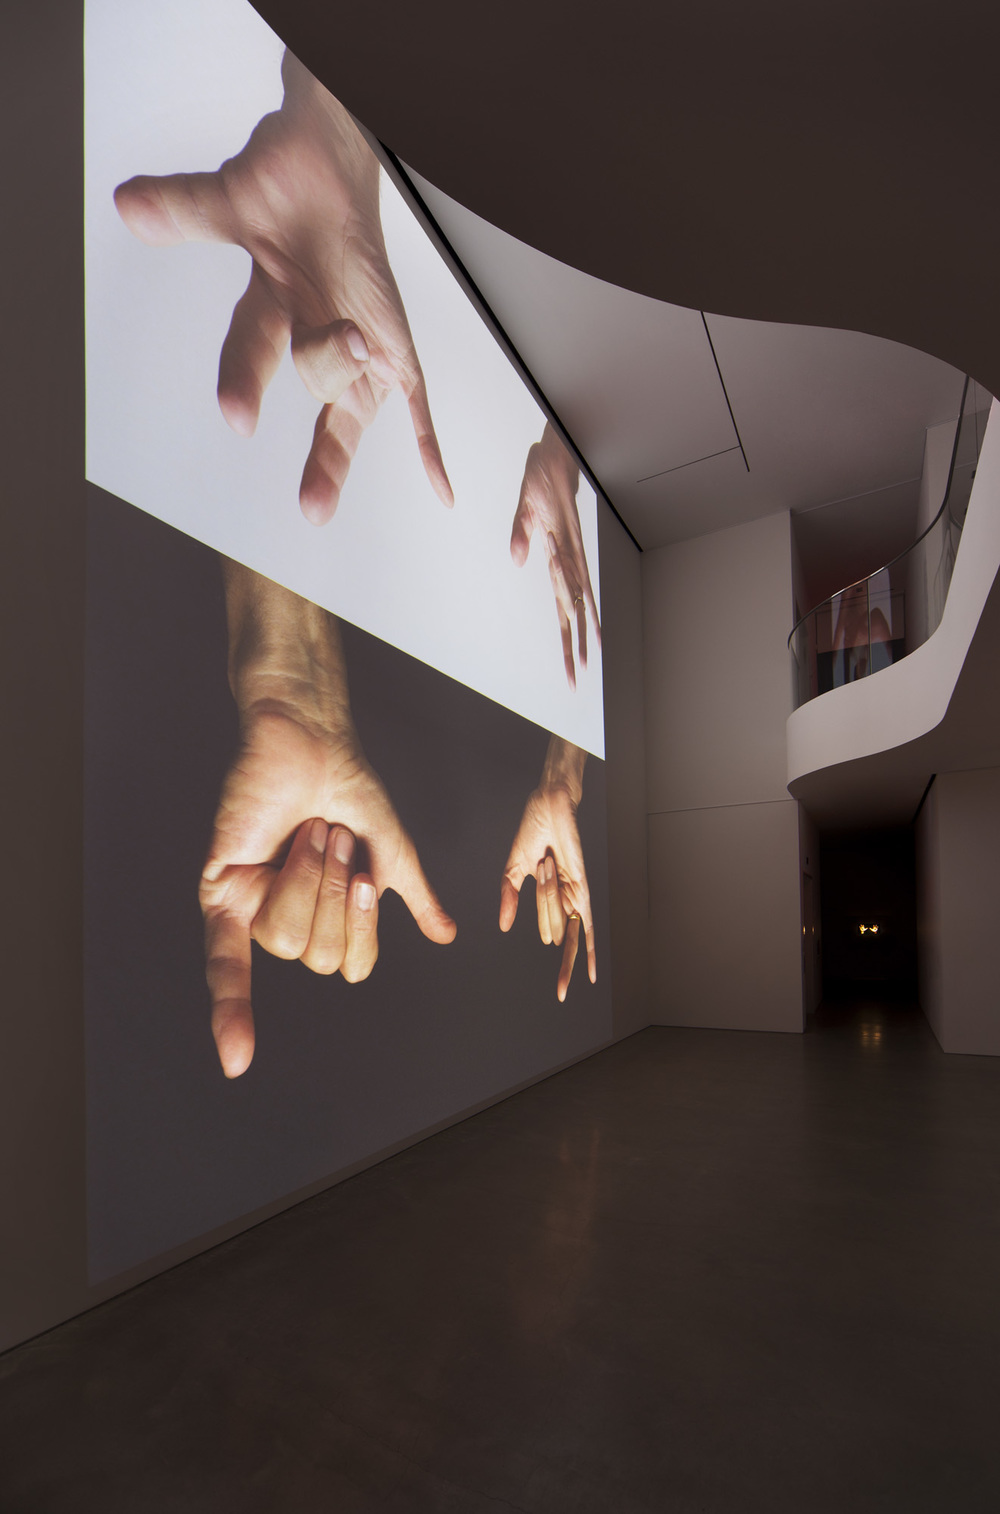 Bruce Nauman, Sperone Westwater Gallery